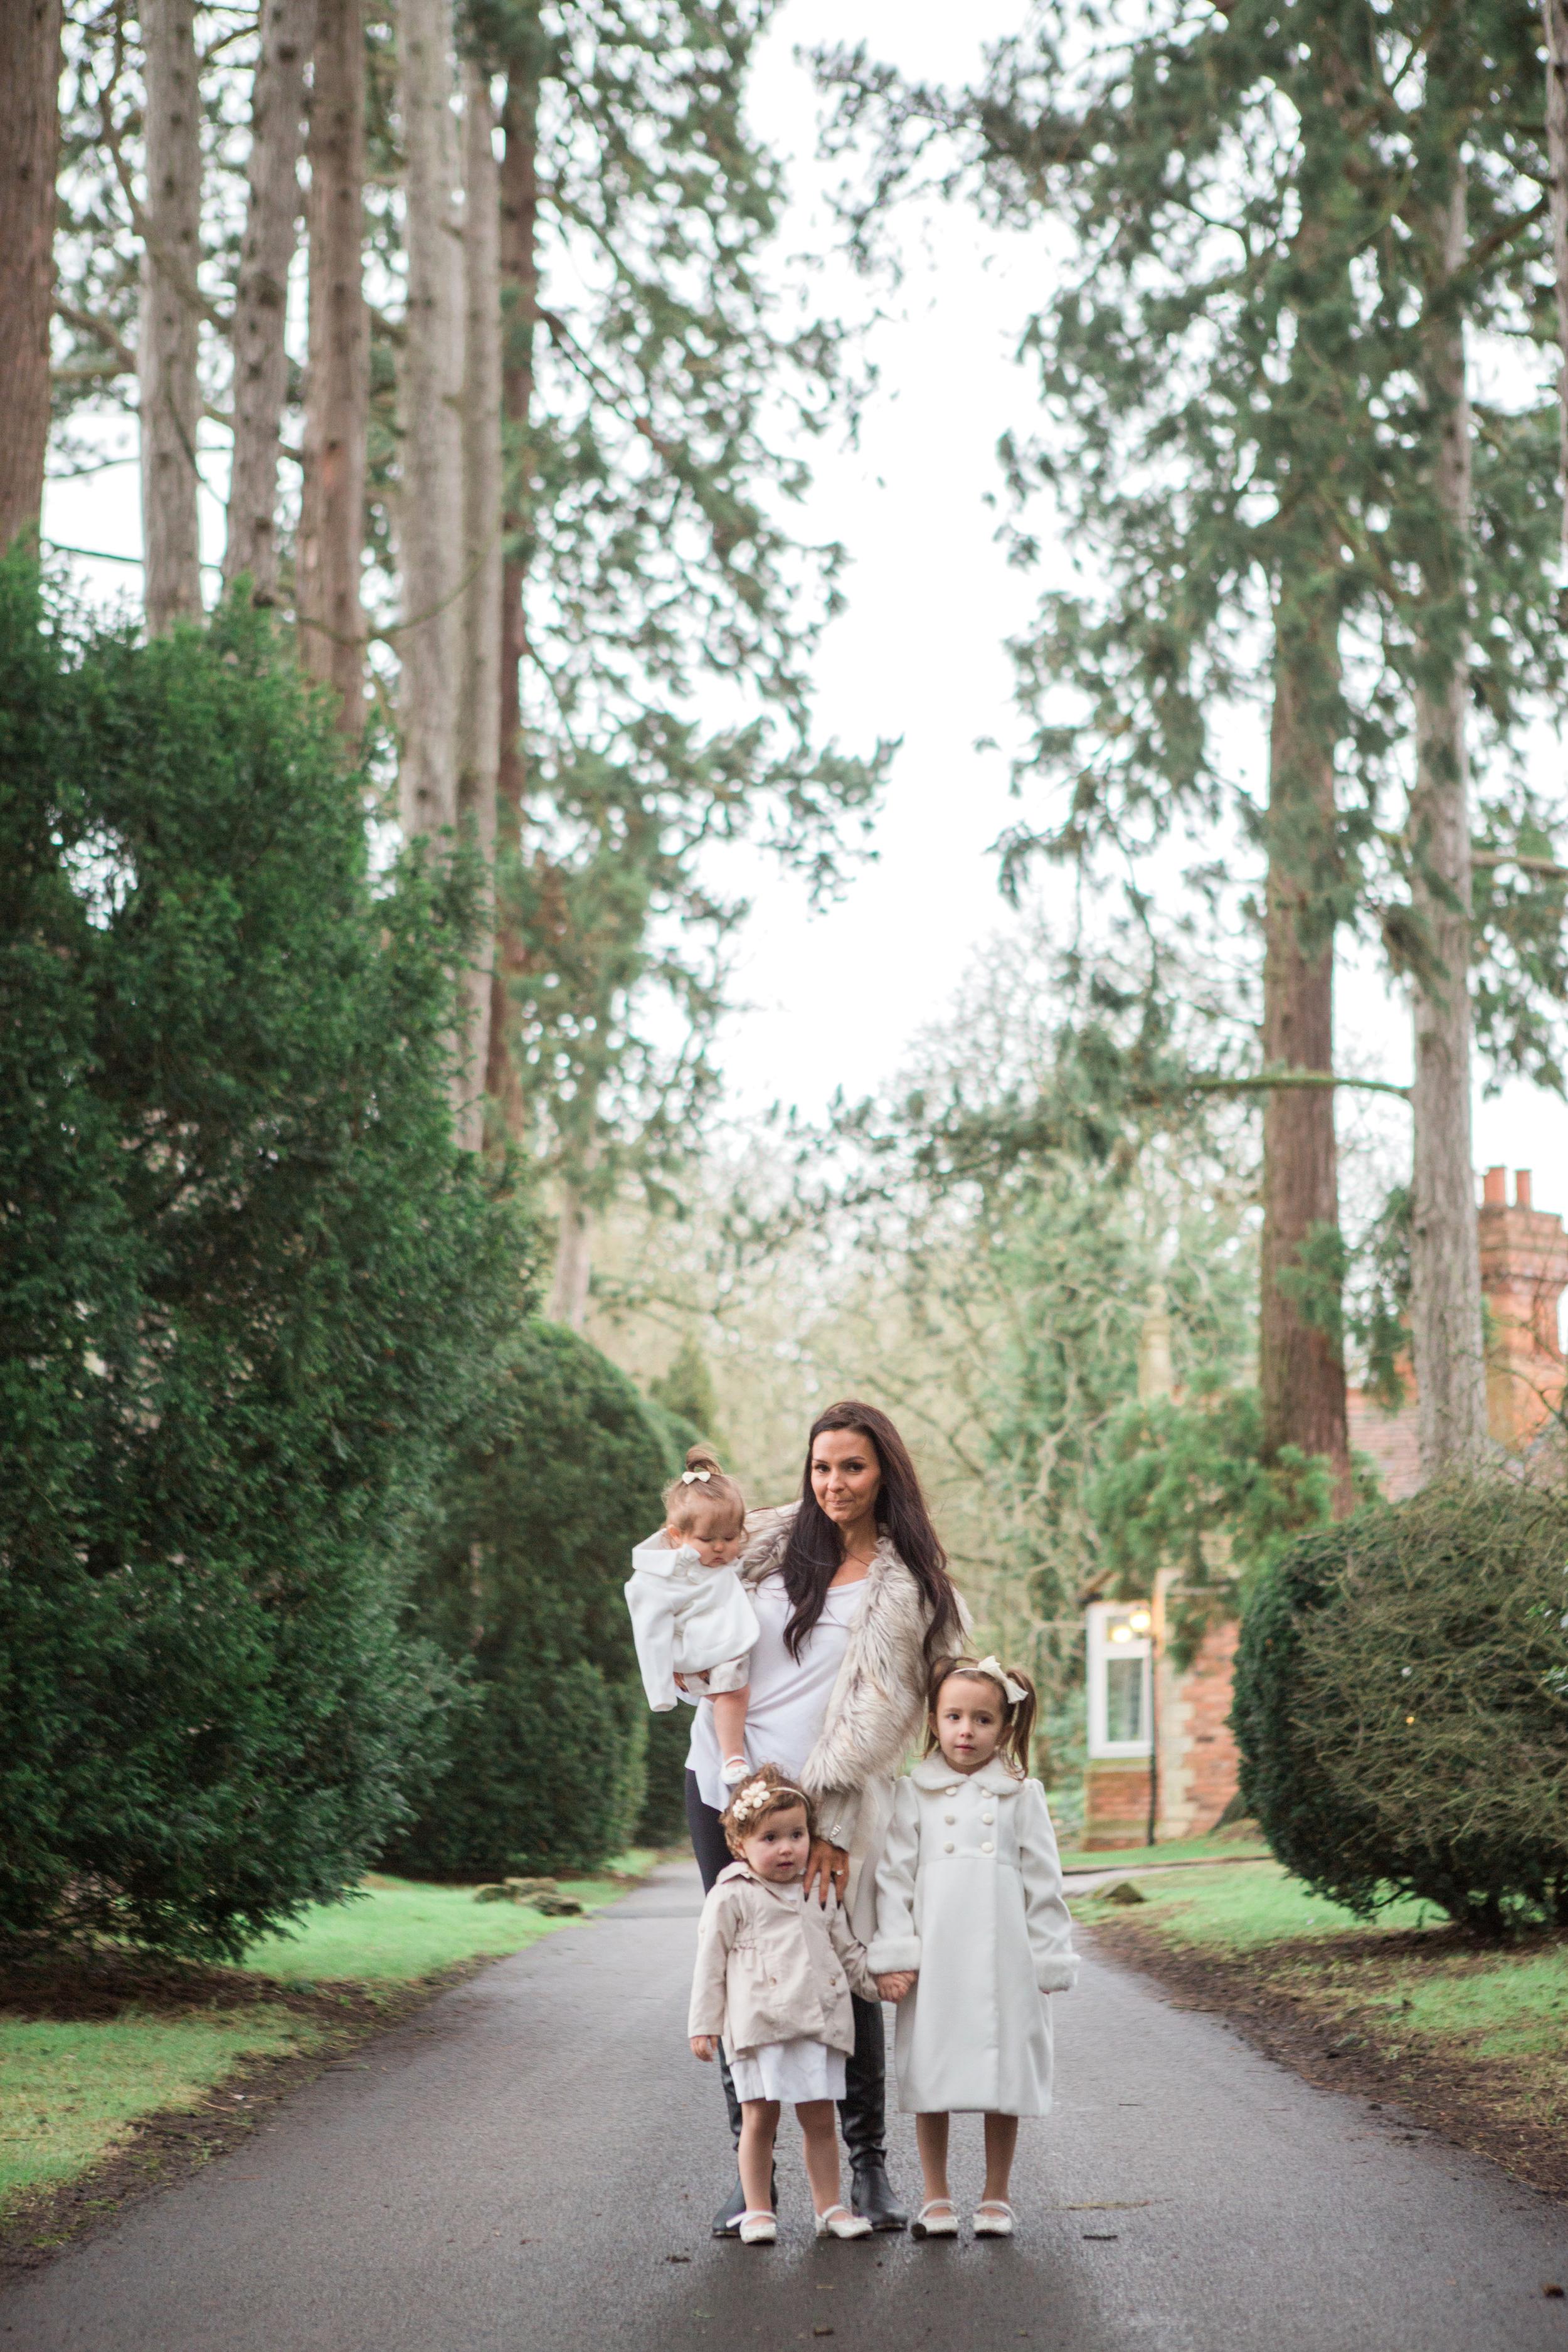 Sophie Evans Photography, At home Family Shoot, Warwickshire, West Midlands, Vicky, Meelia, Amiya & Kiki (18).jpg